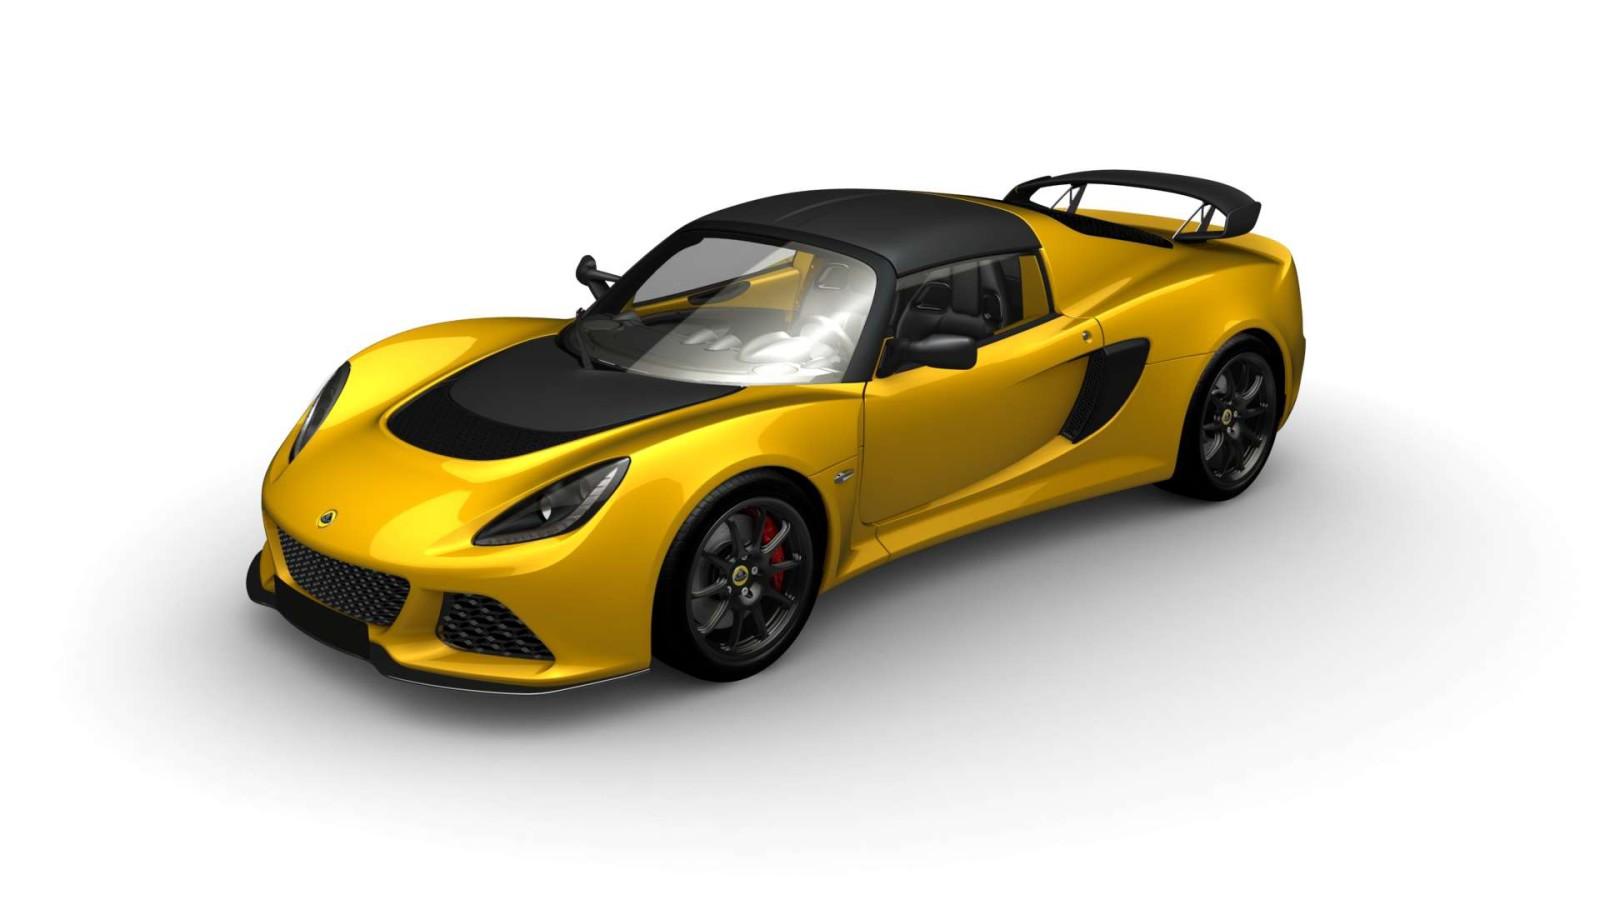 Lotus Exice 350 Sport